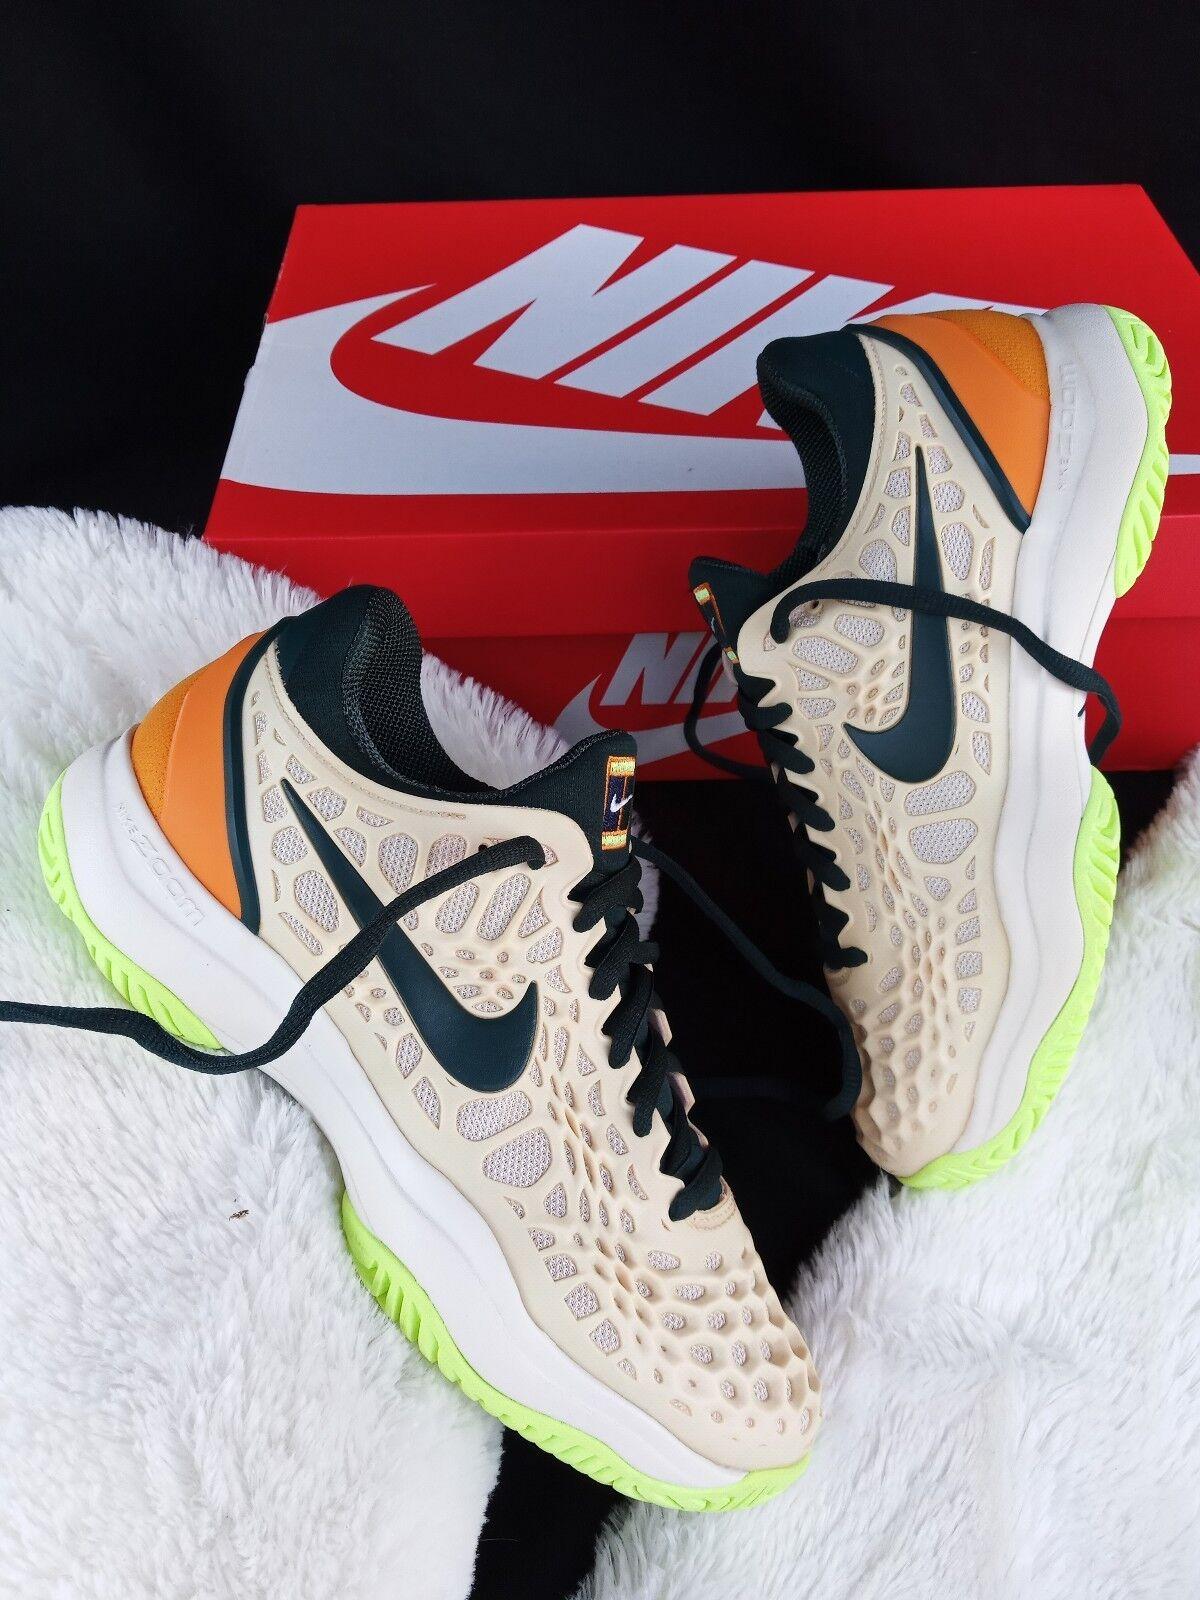 8 women's Nike Air Zoom Cage 3 HC Tennis beige Green 918199-800 white yellow